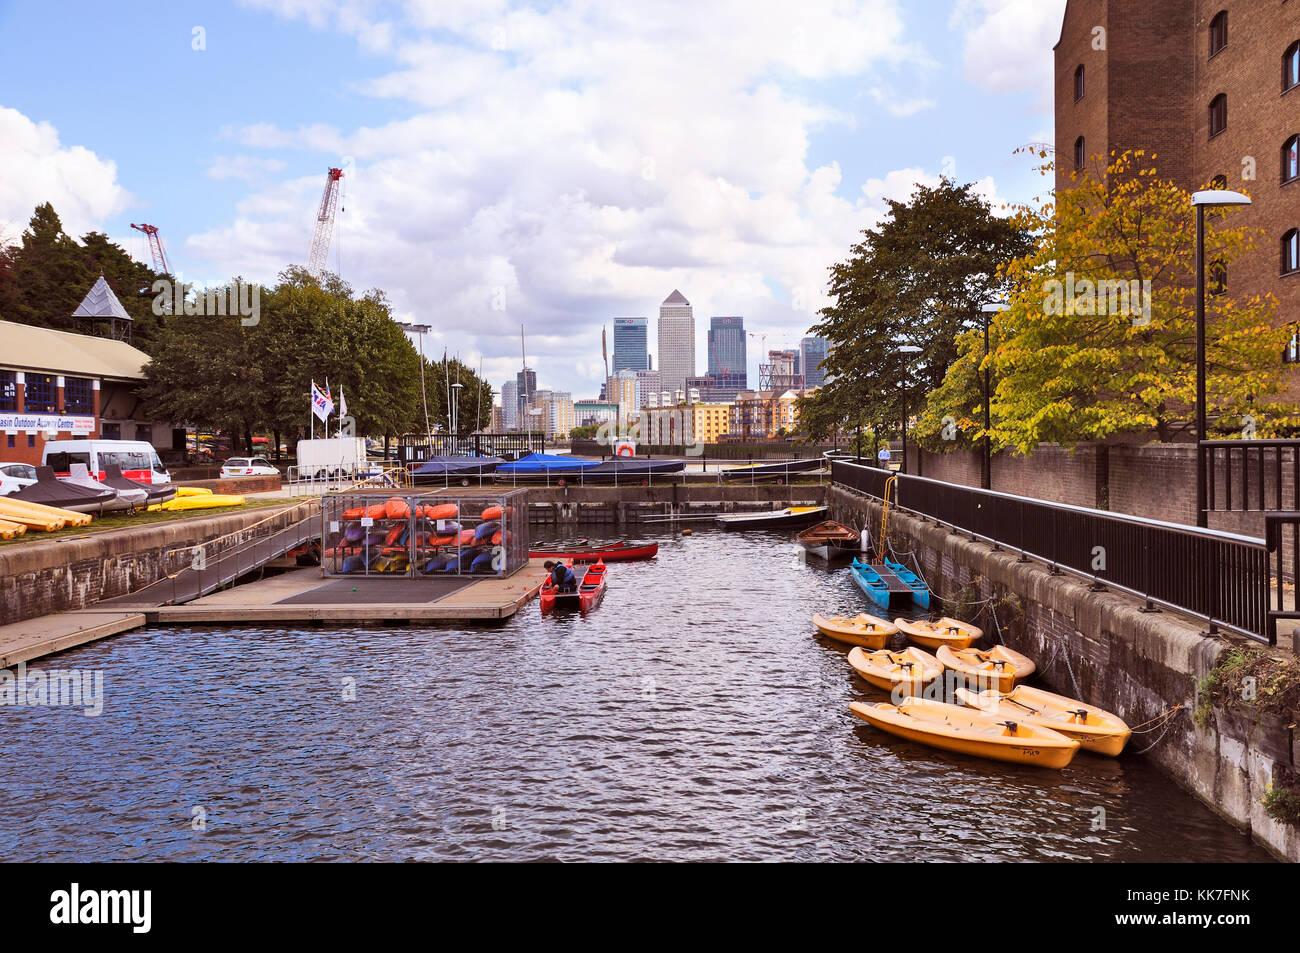 Shadwell Basin Outdoor Activity Centre and Canary Wharf skyline, Tower Hamlets, London, UK, - Stock Image